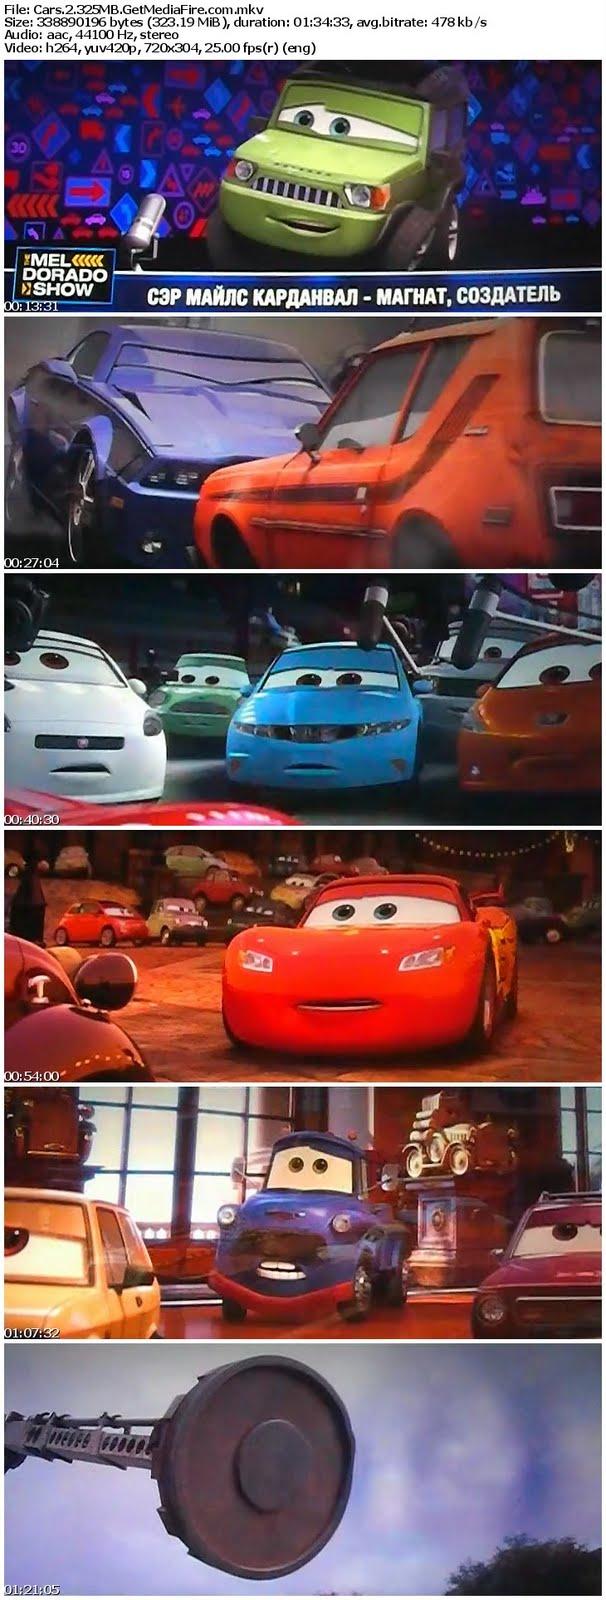 2011 cars